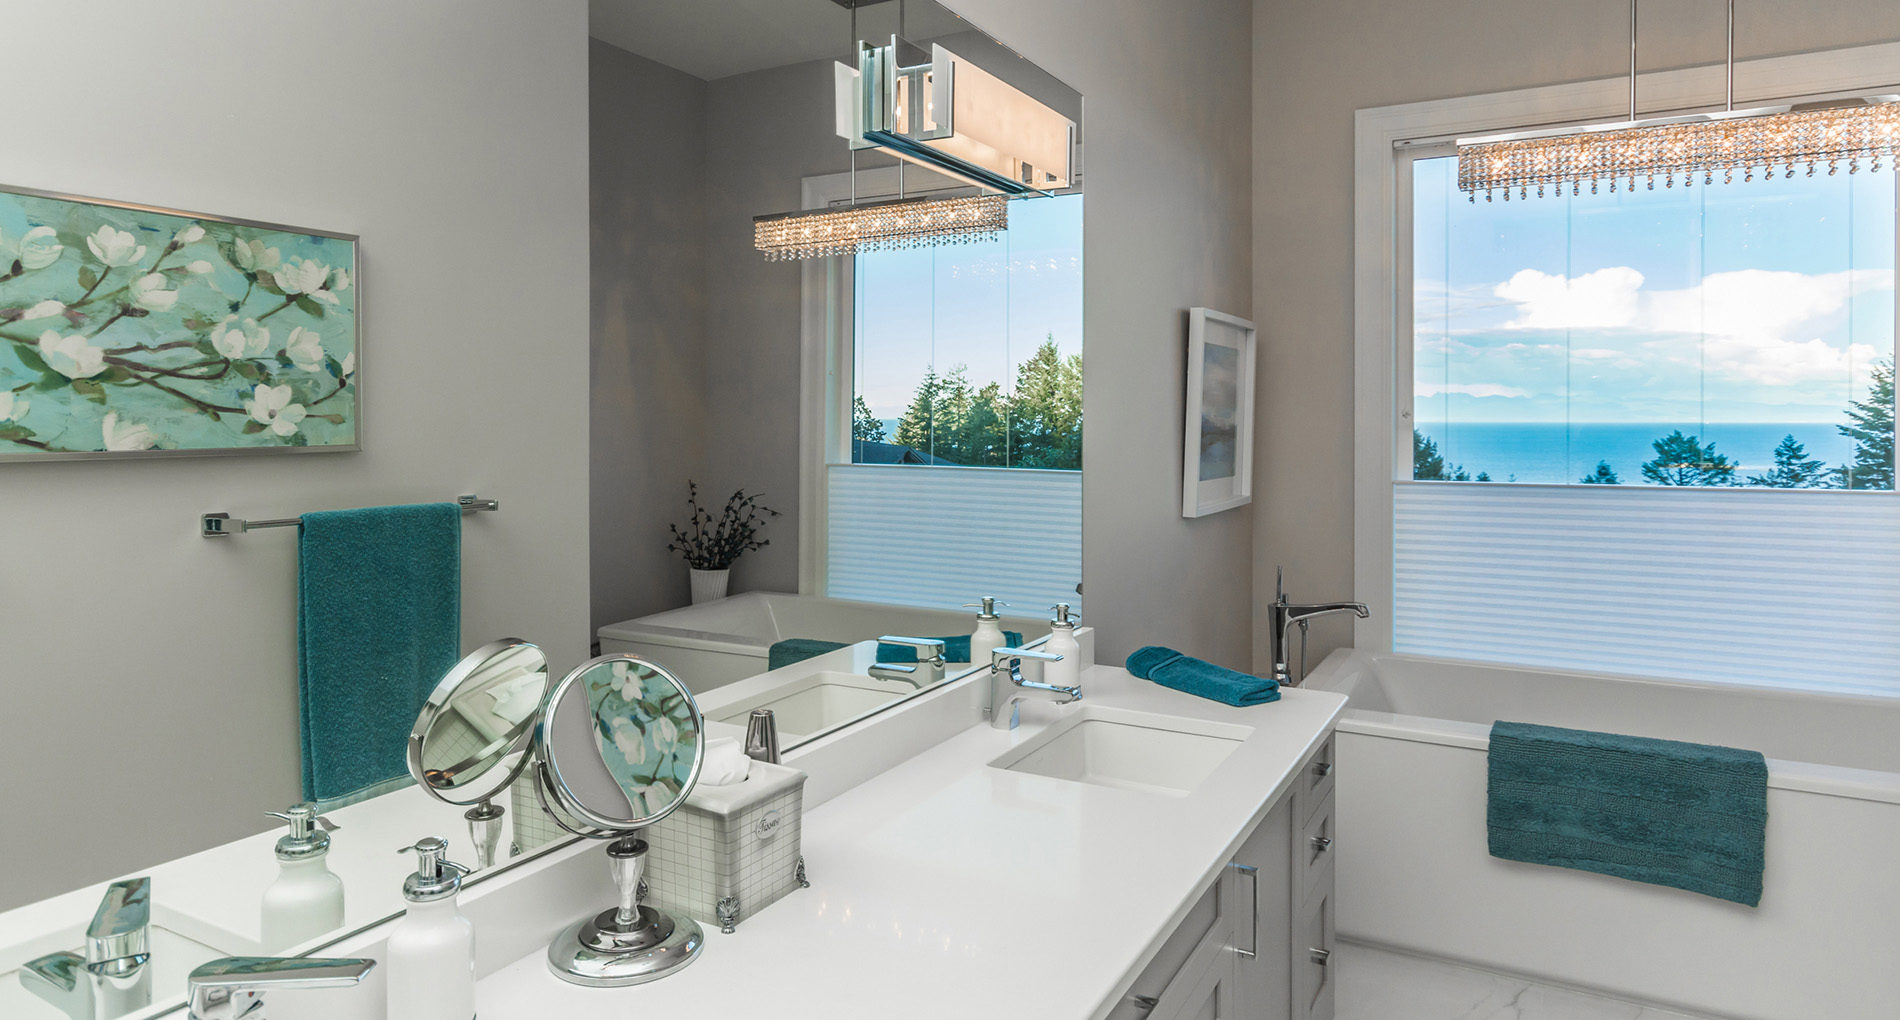 Green Bay Custom Bathroom Remodeling Design Alair Homes Green Bay - Bathroom remodel green bay